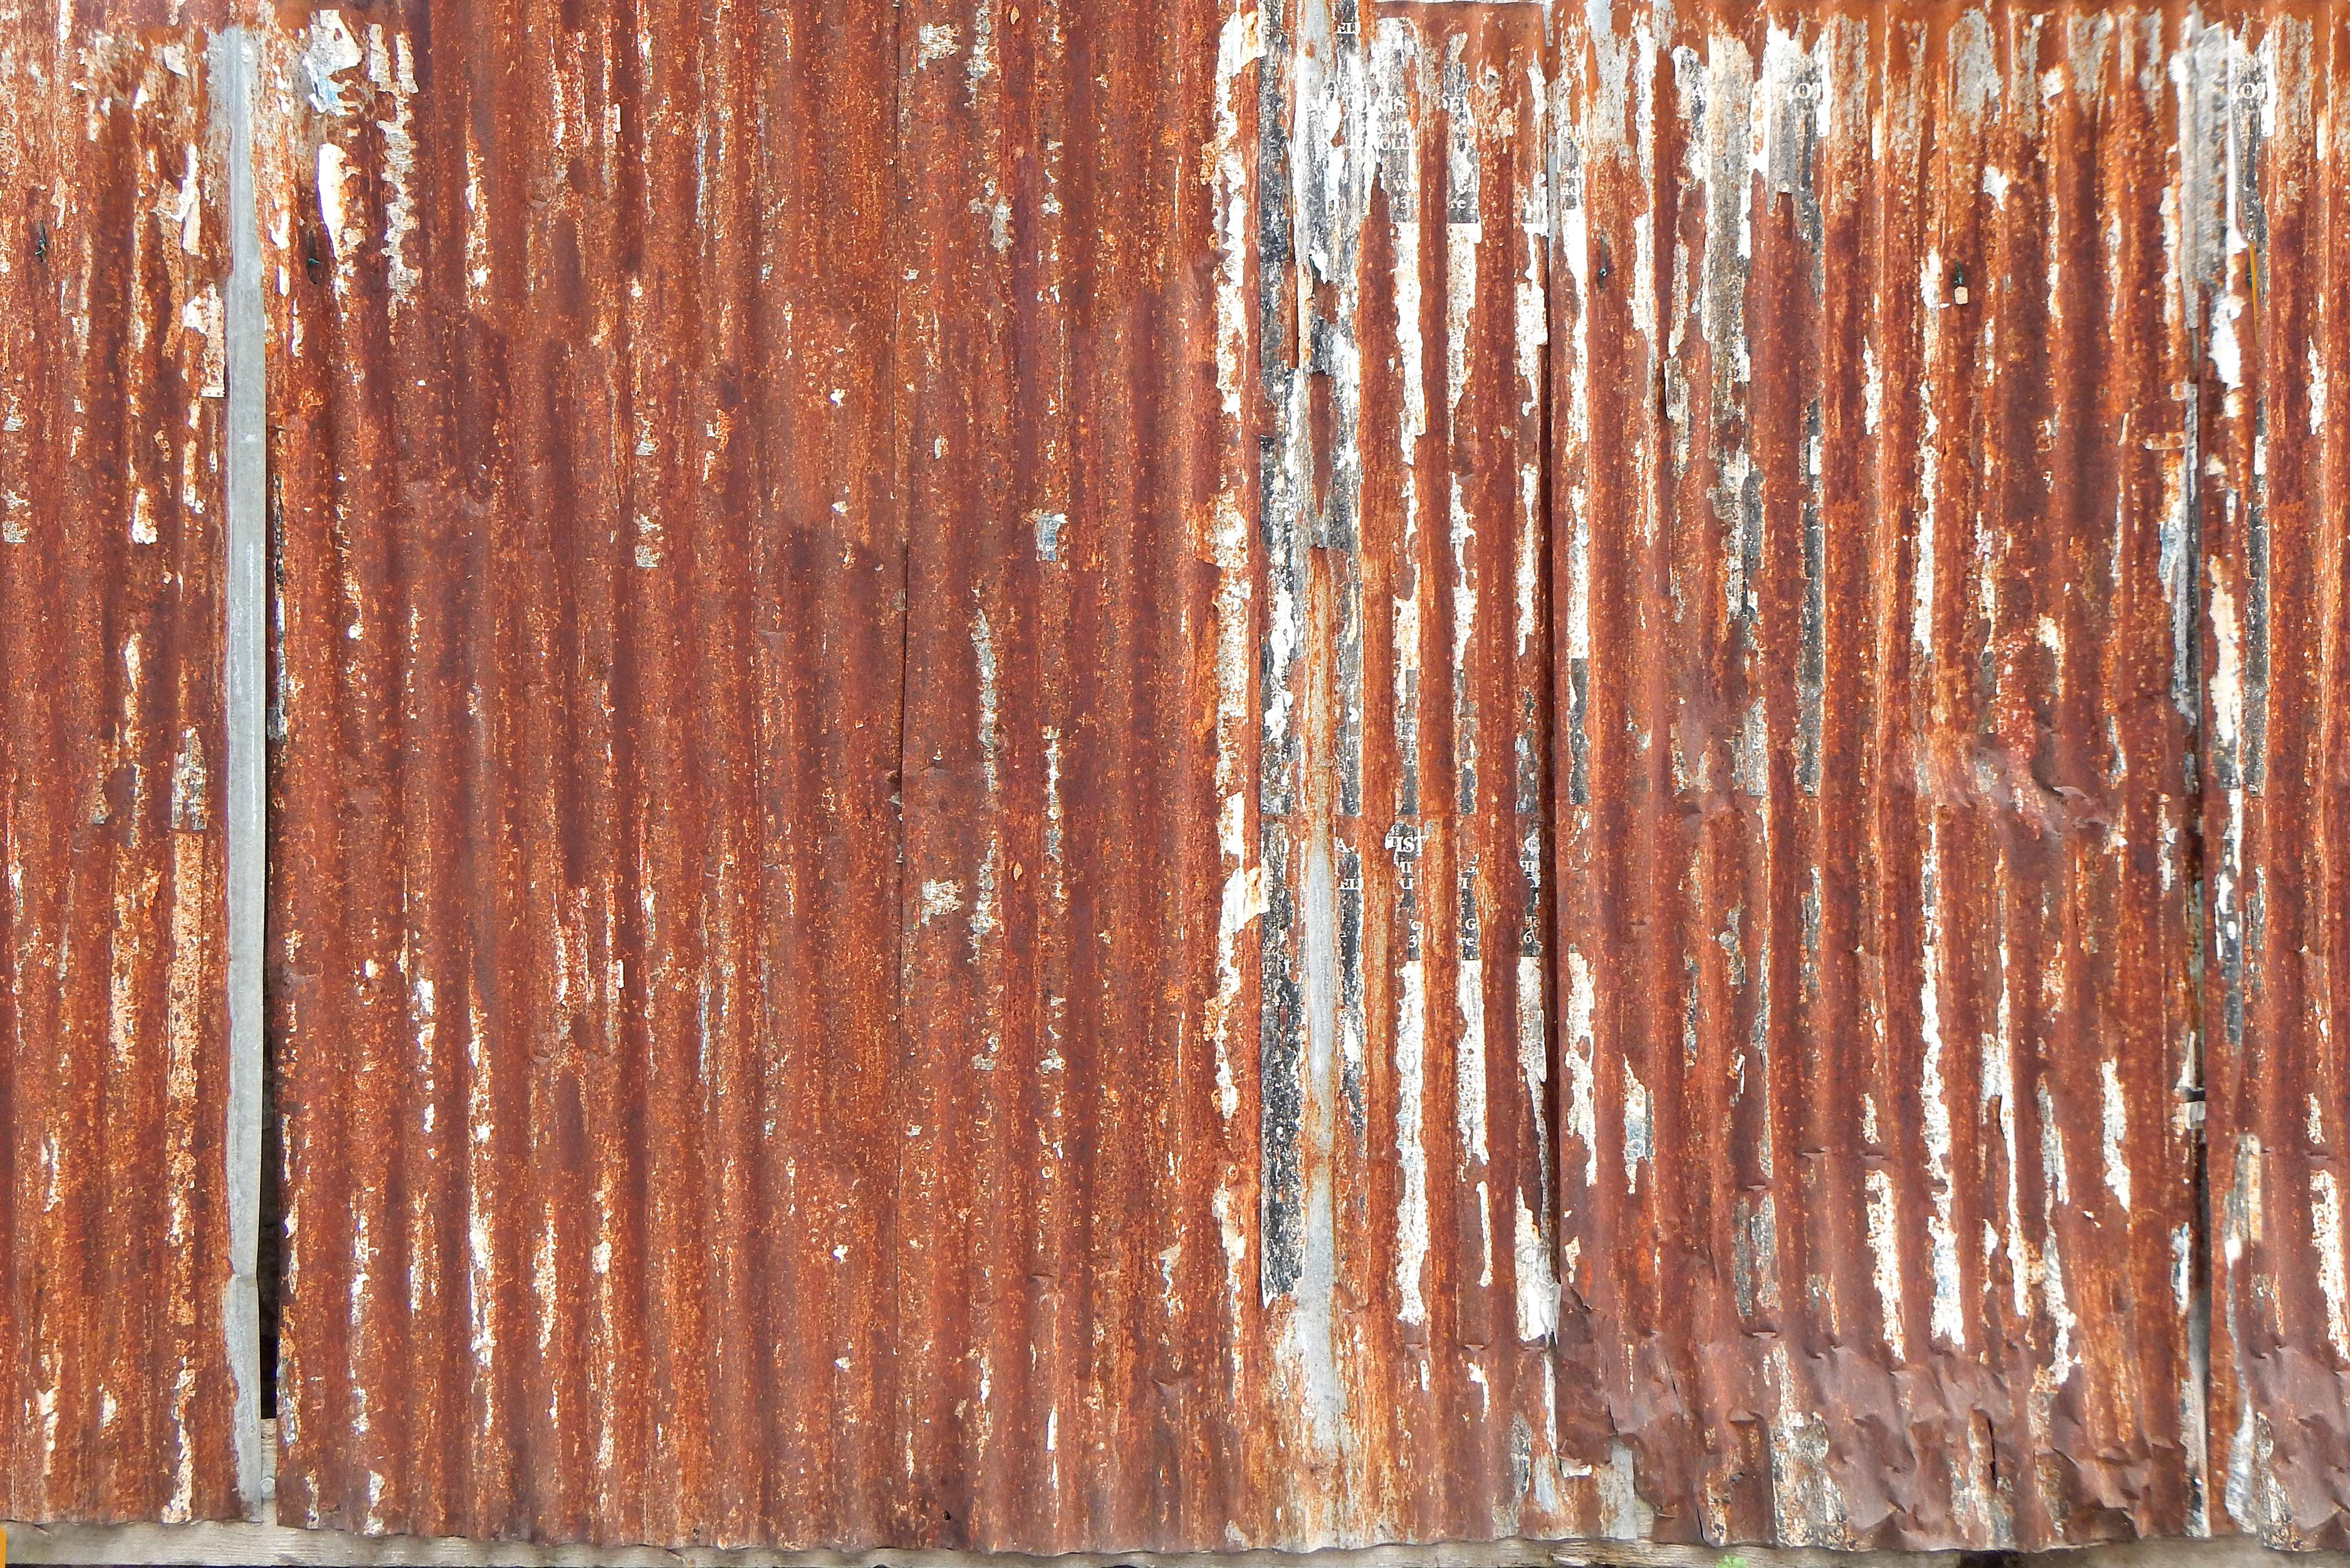 Fall Ceiling Wallpaper Hd Free Photo Rusty Panel Steel Rusty Surface Free